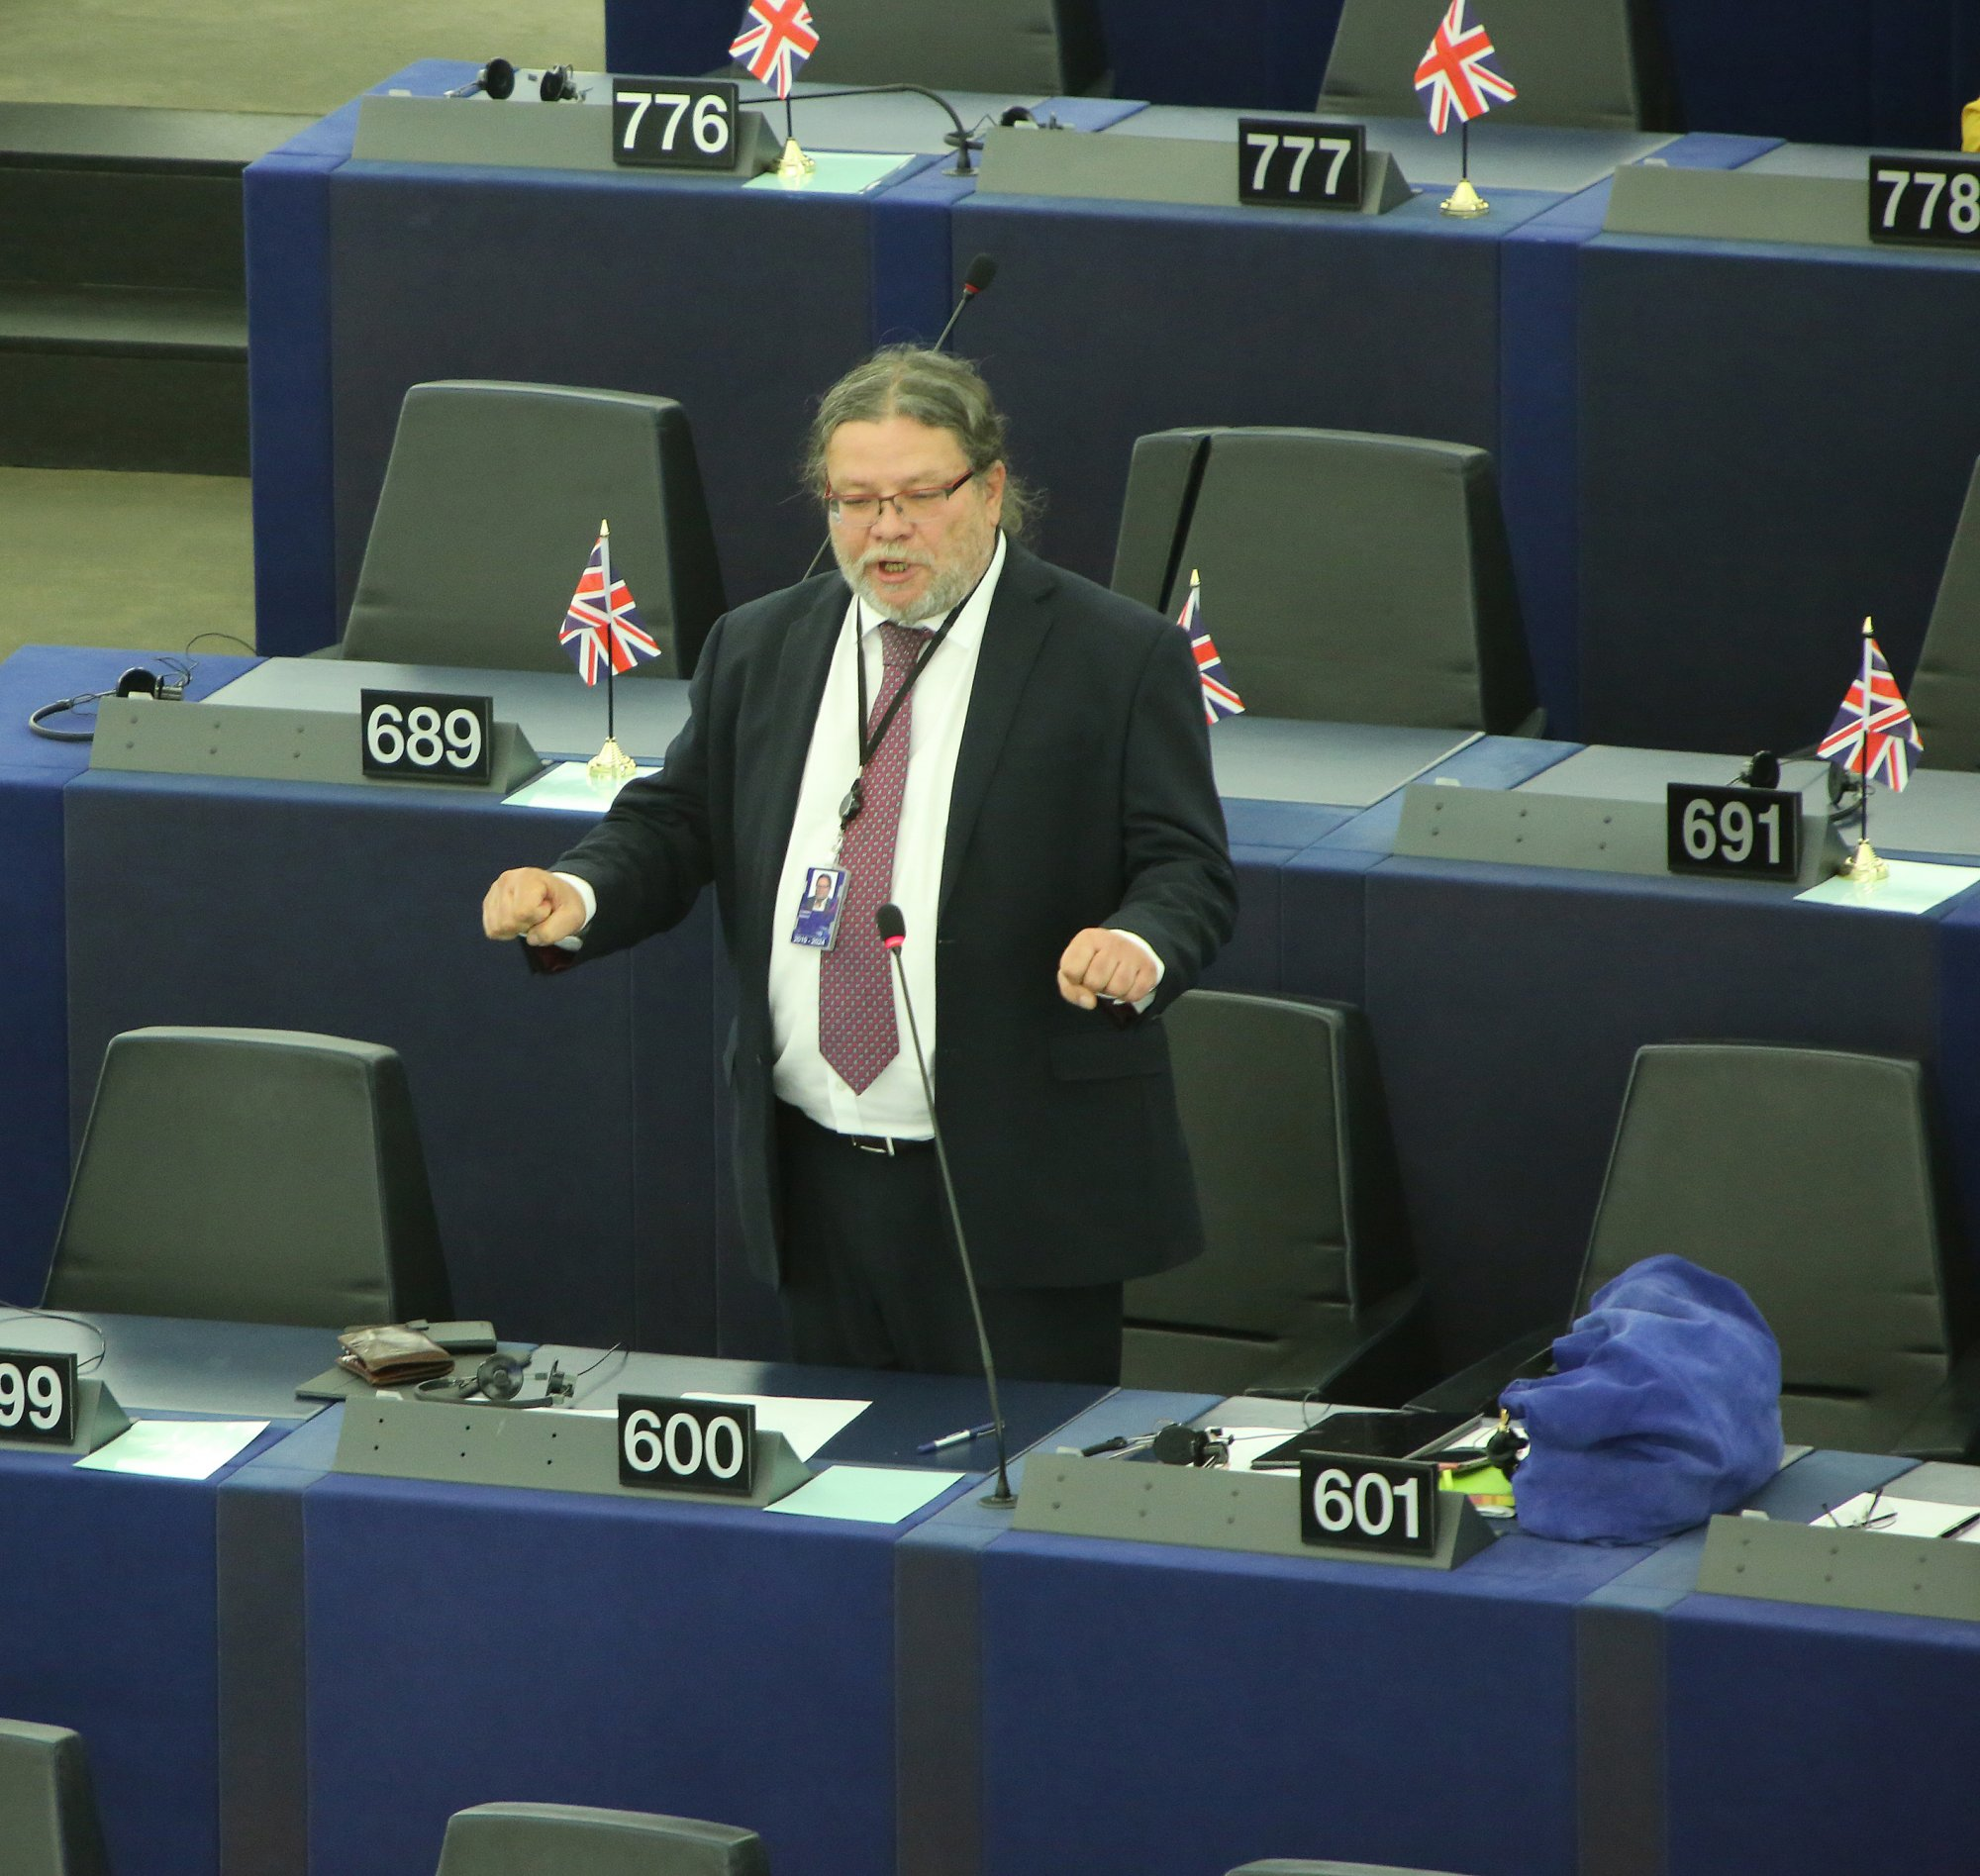 Olovo v Evropském parlamentu